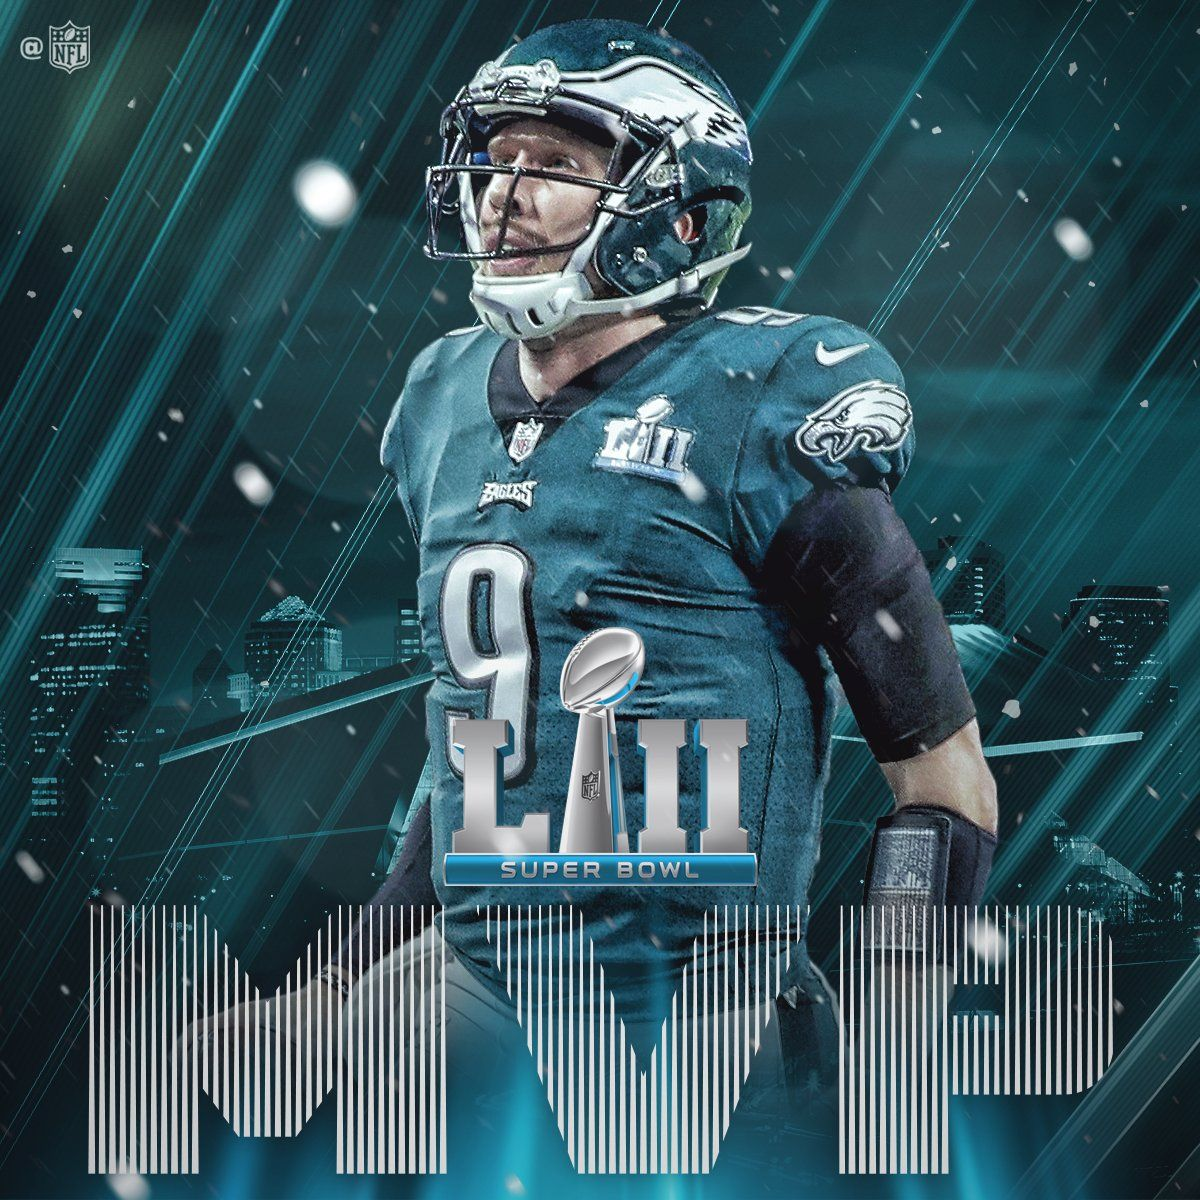 The Nfl Created This Twitter Graphic To Announce Nick Foles Winning Mvp Of Super Bowl Lii Nfl N Philadelphia Eagles Philadelphia Eagles Football Eagles Nfl